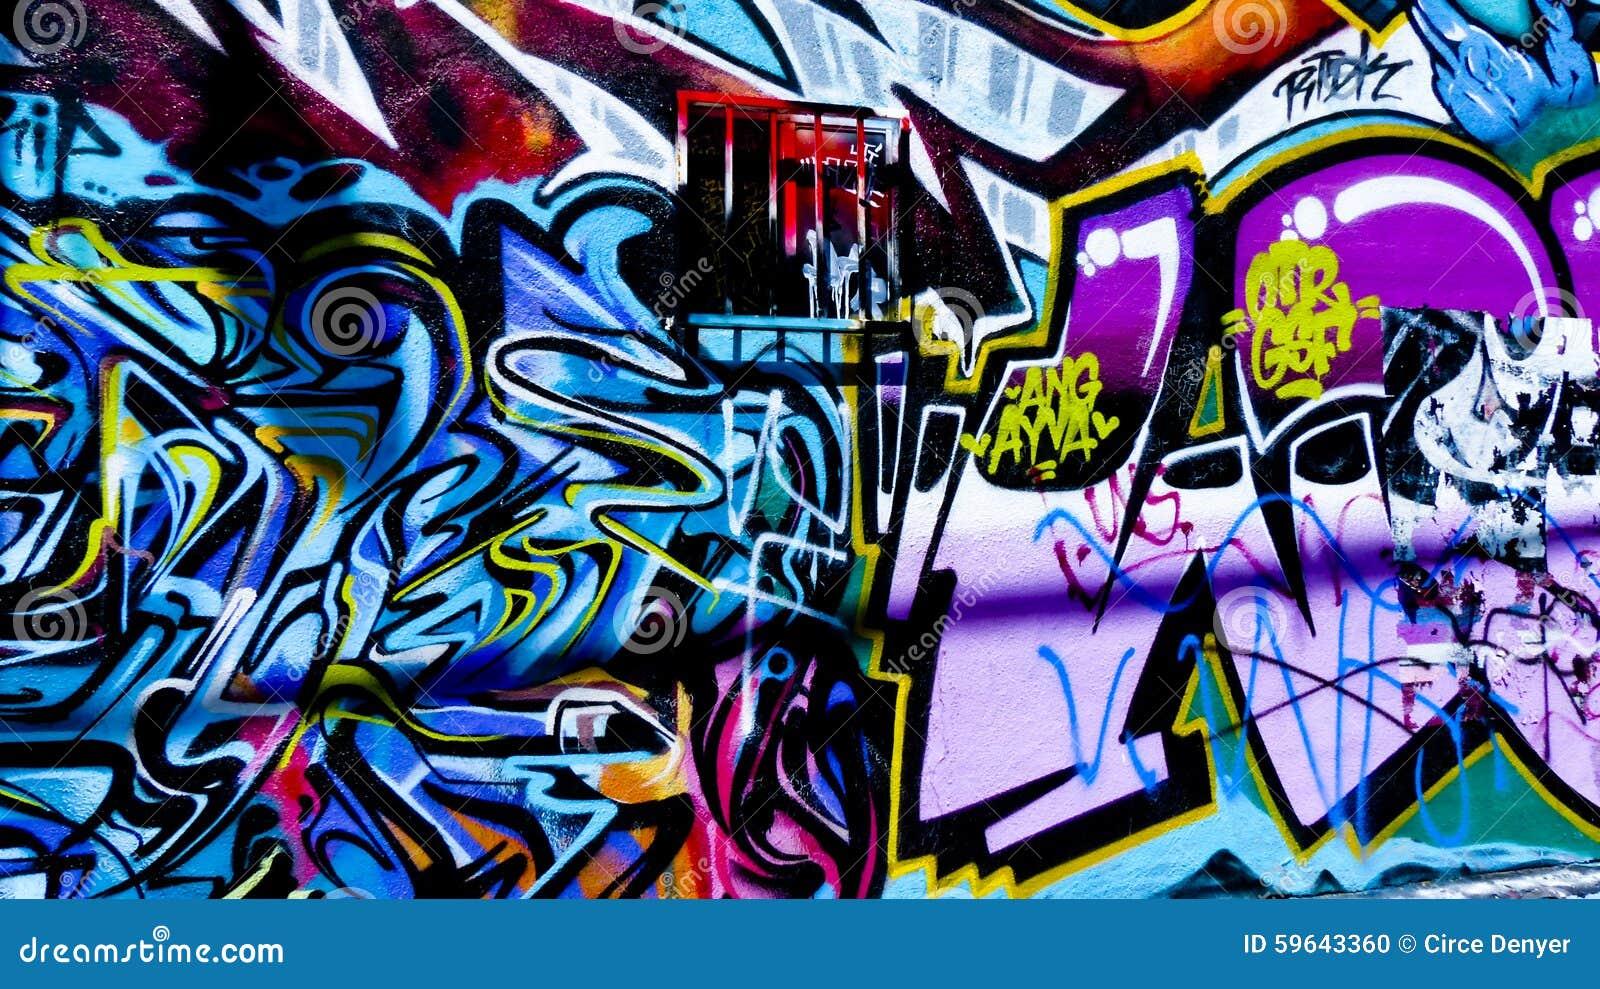 Graffiti wall black - Graffiti Wall